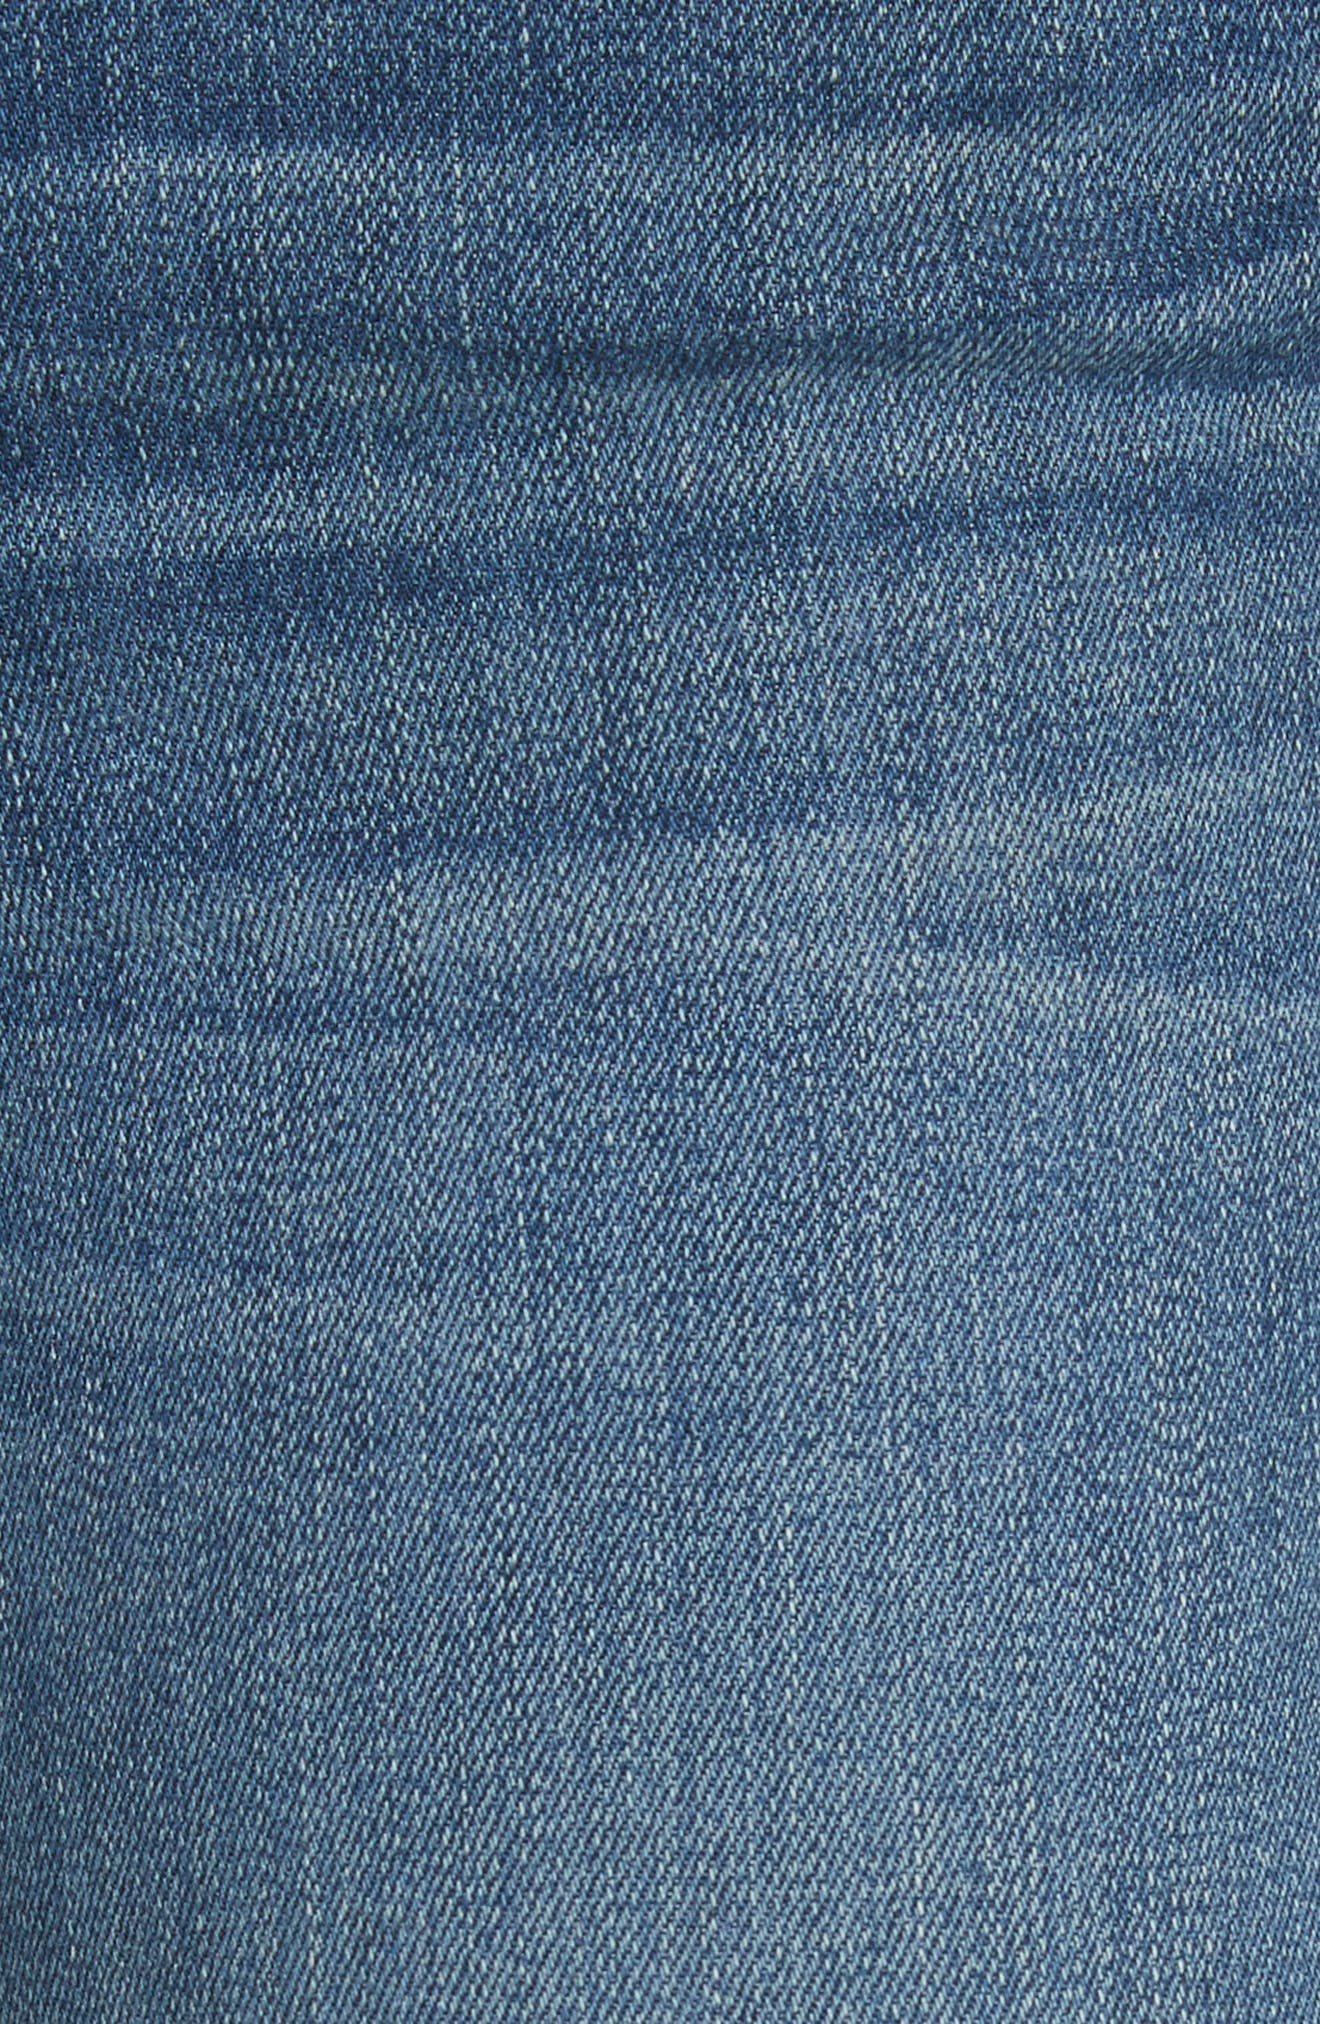 W4 Abigail Released Split Hem Ankle Skinny Jeans,                             Alternate thumbnail 5, color,                             Ady